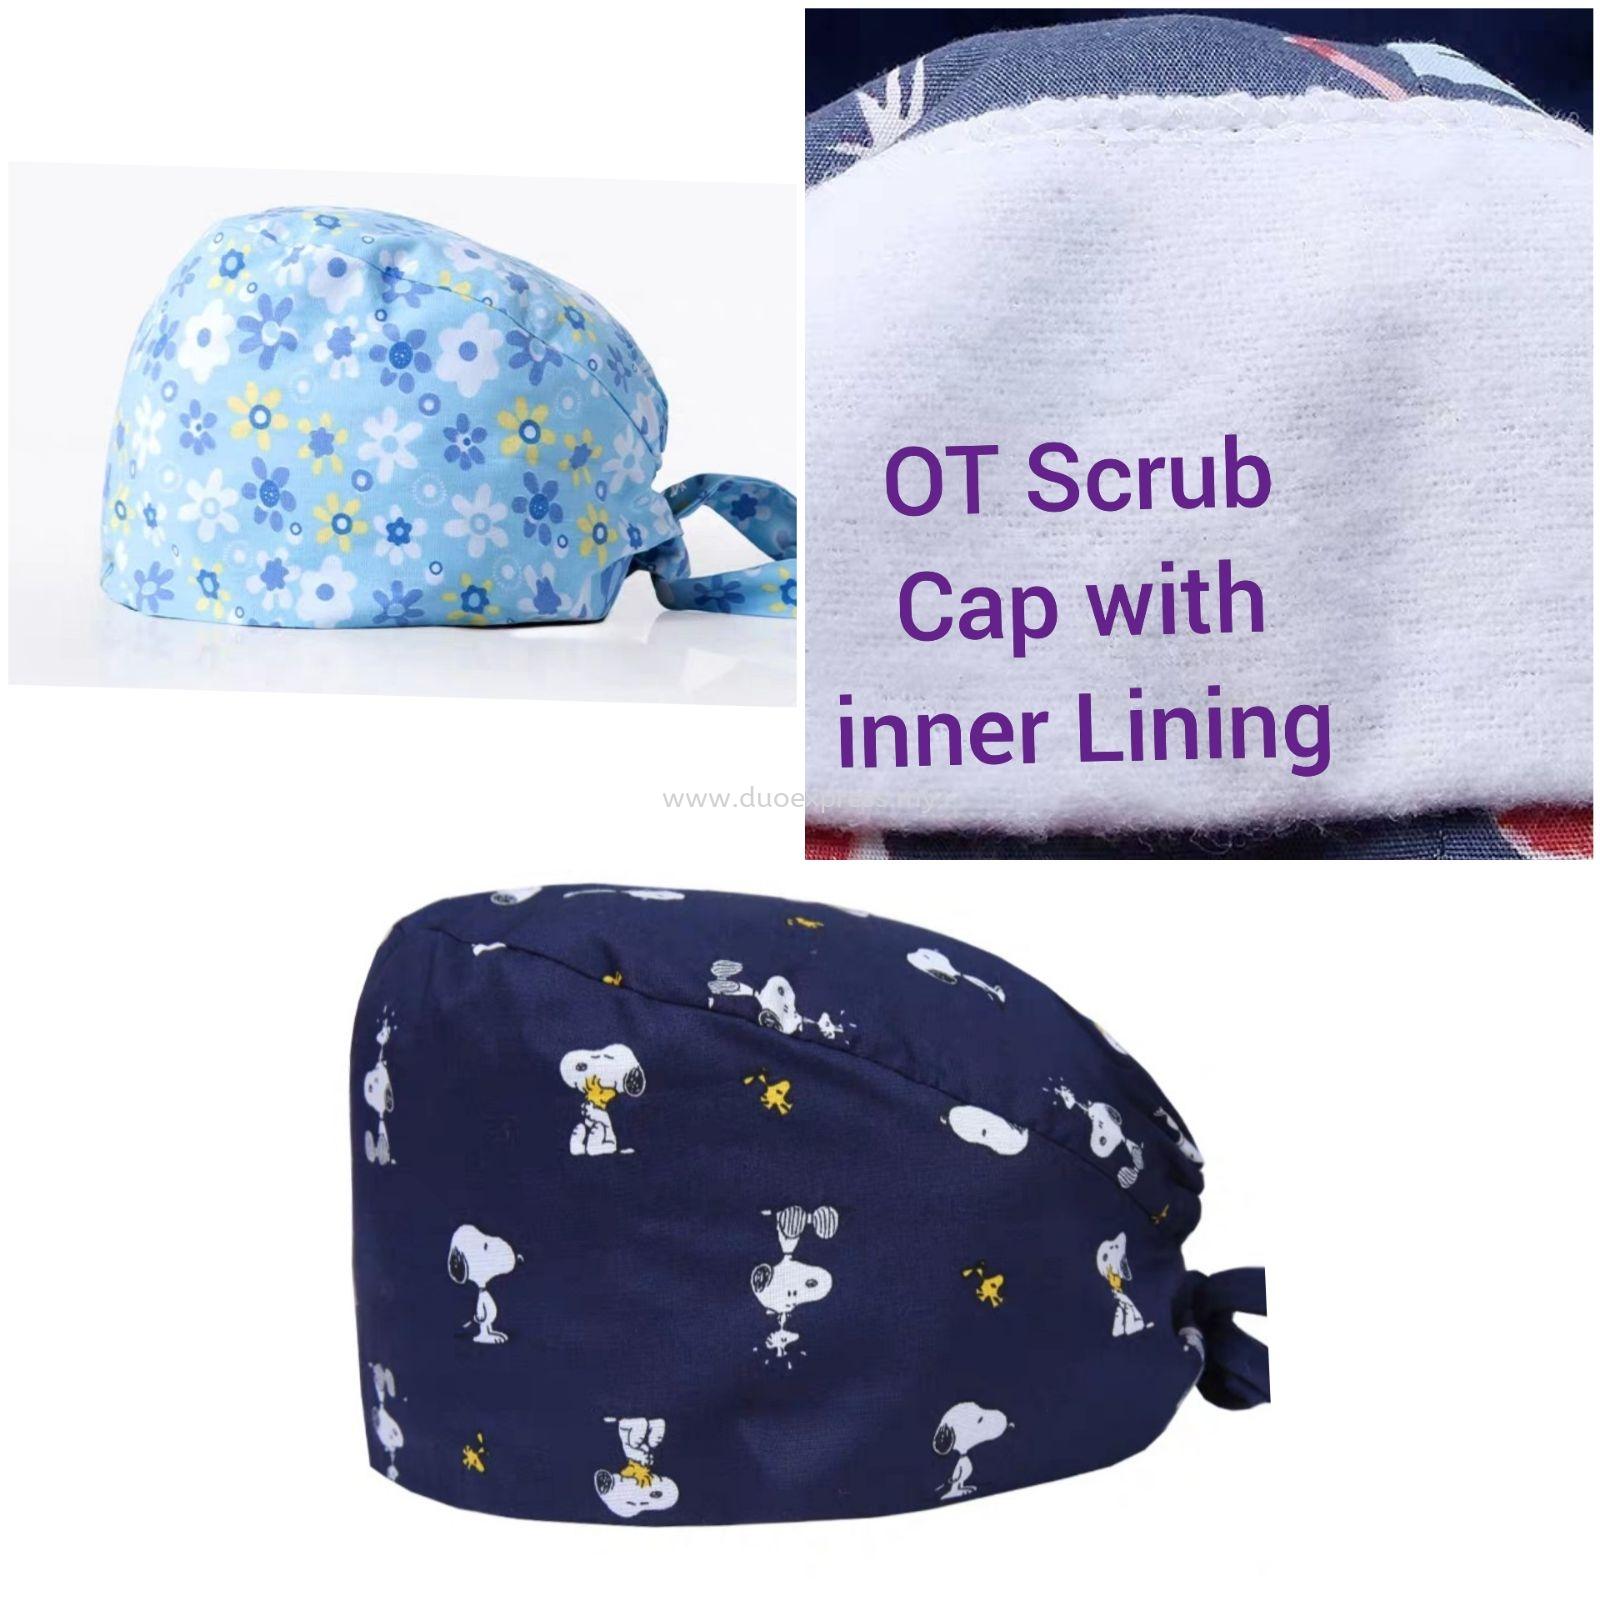 OT Scrub Cap